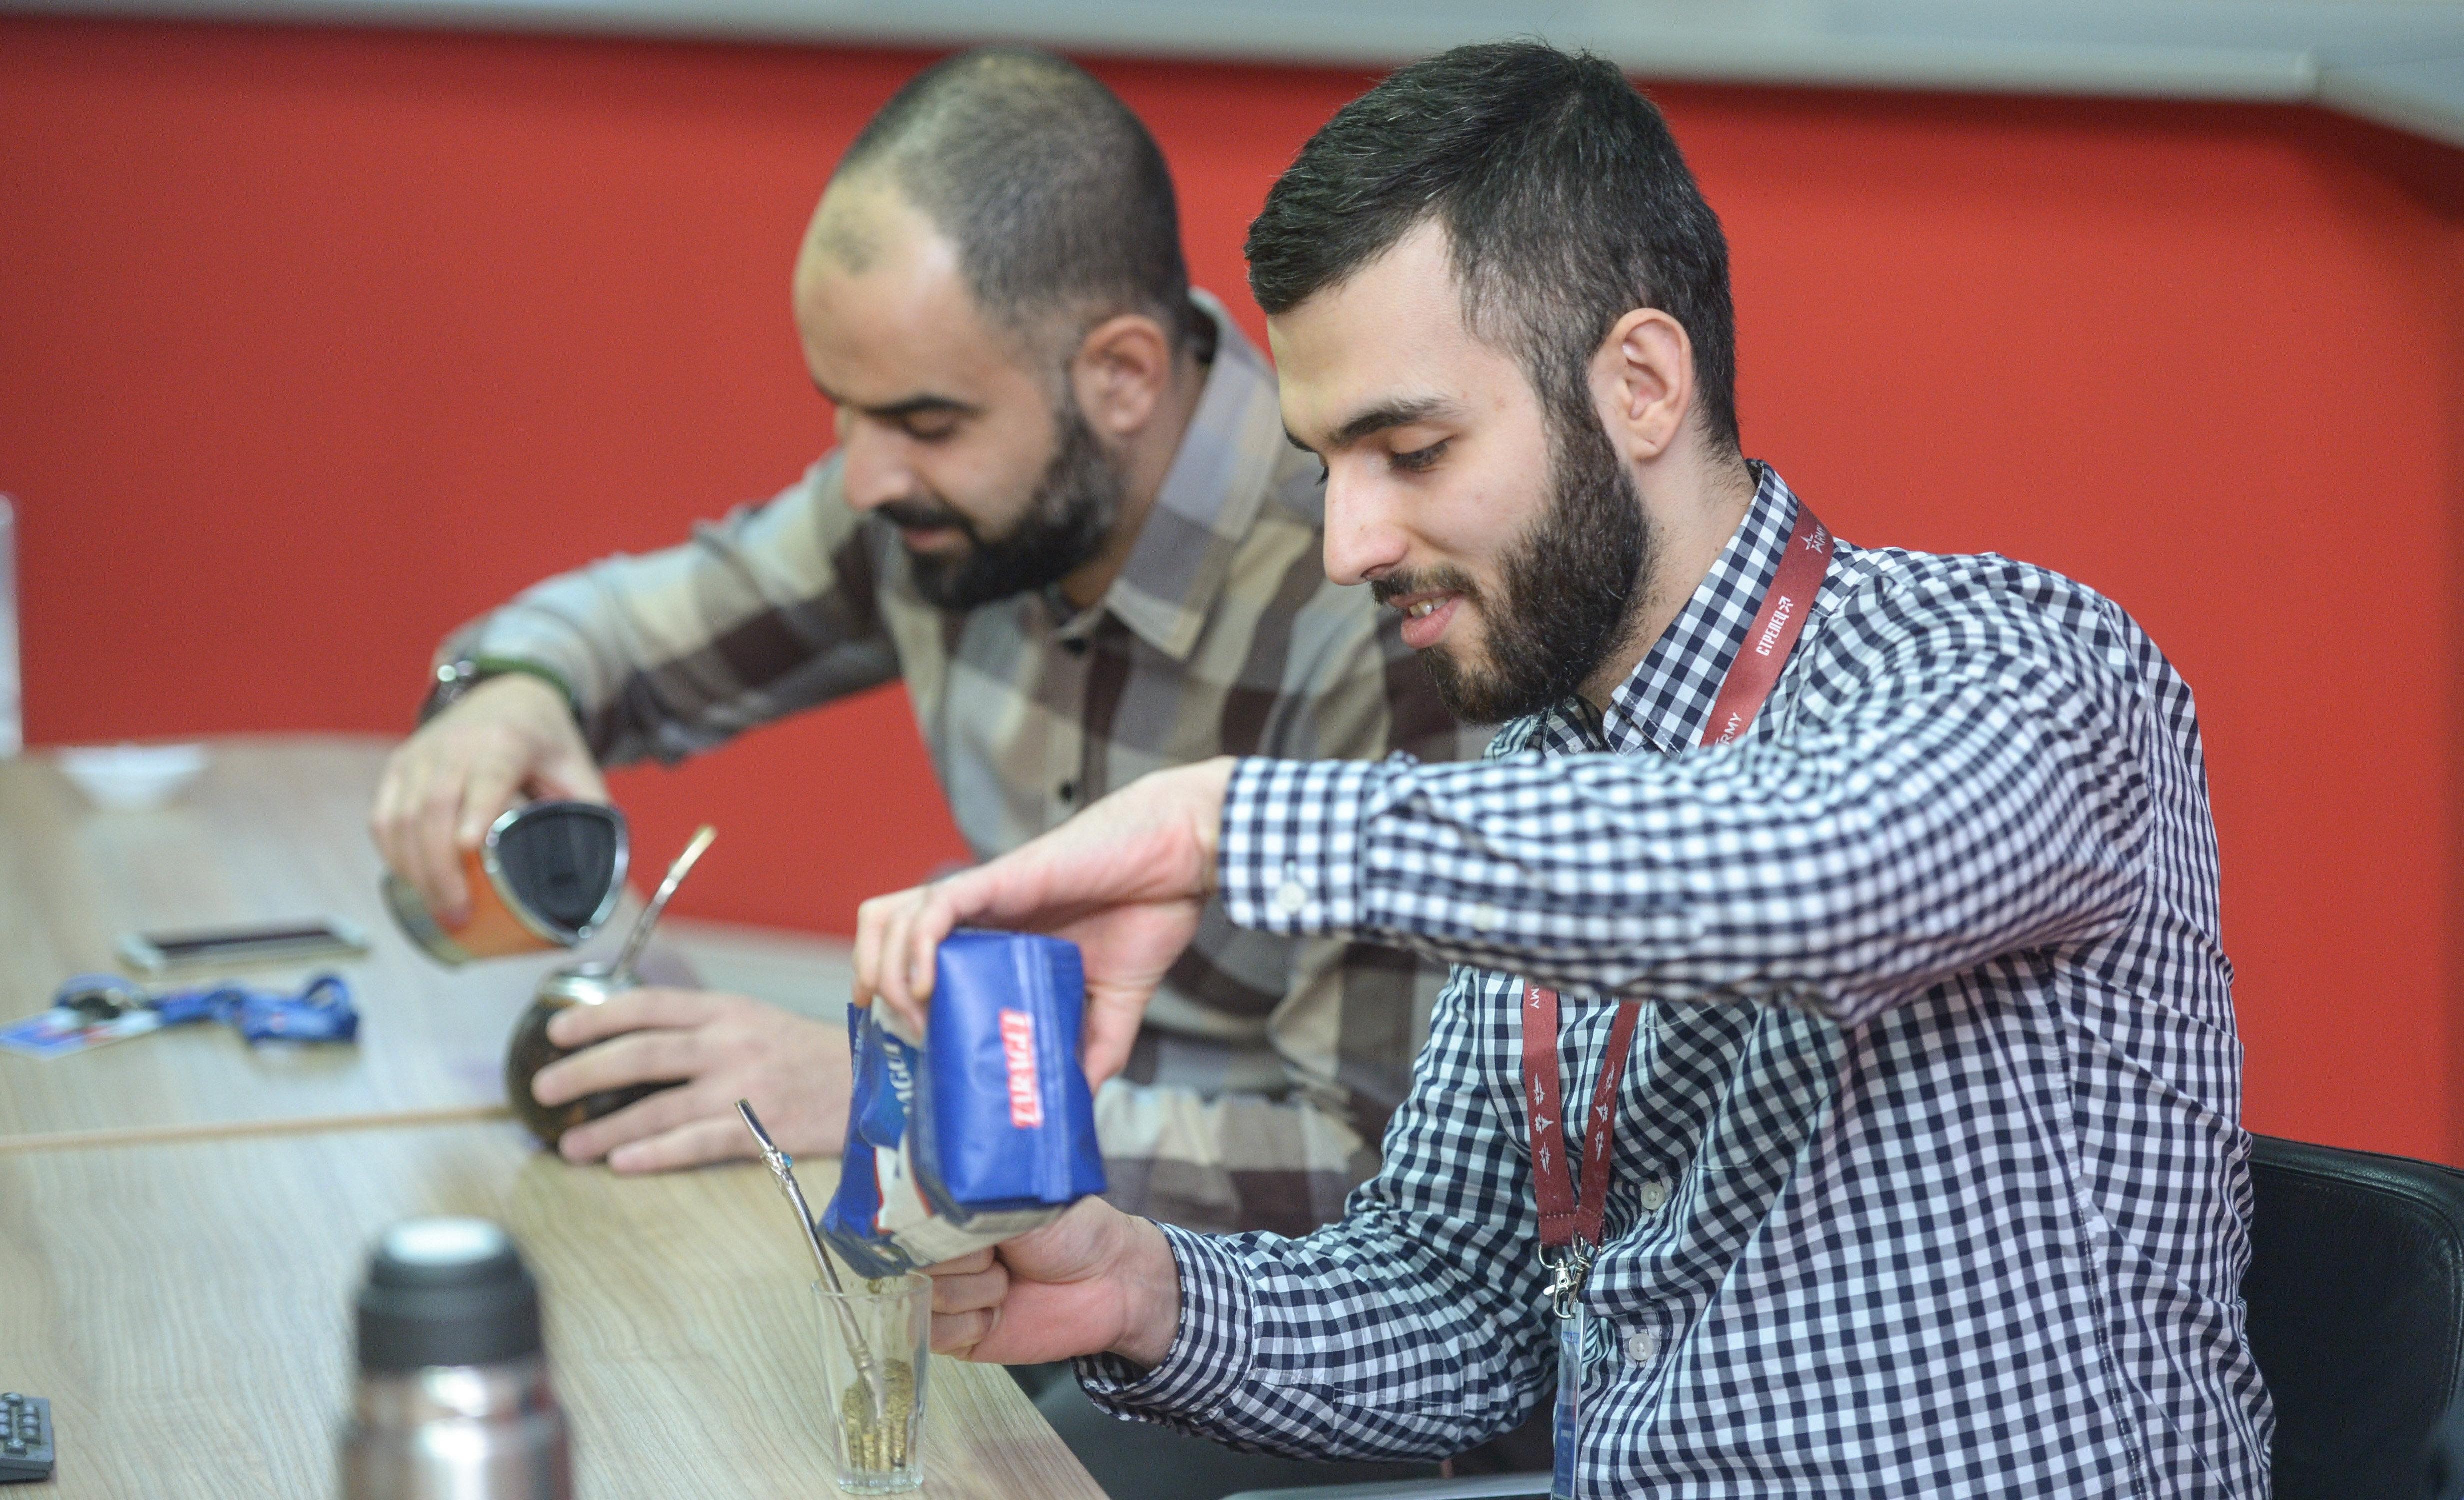 Mans Matni y Jhony Elias preparan un mate al estilo sirio